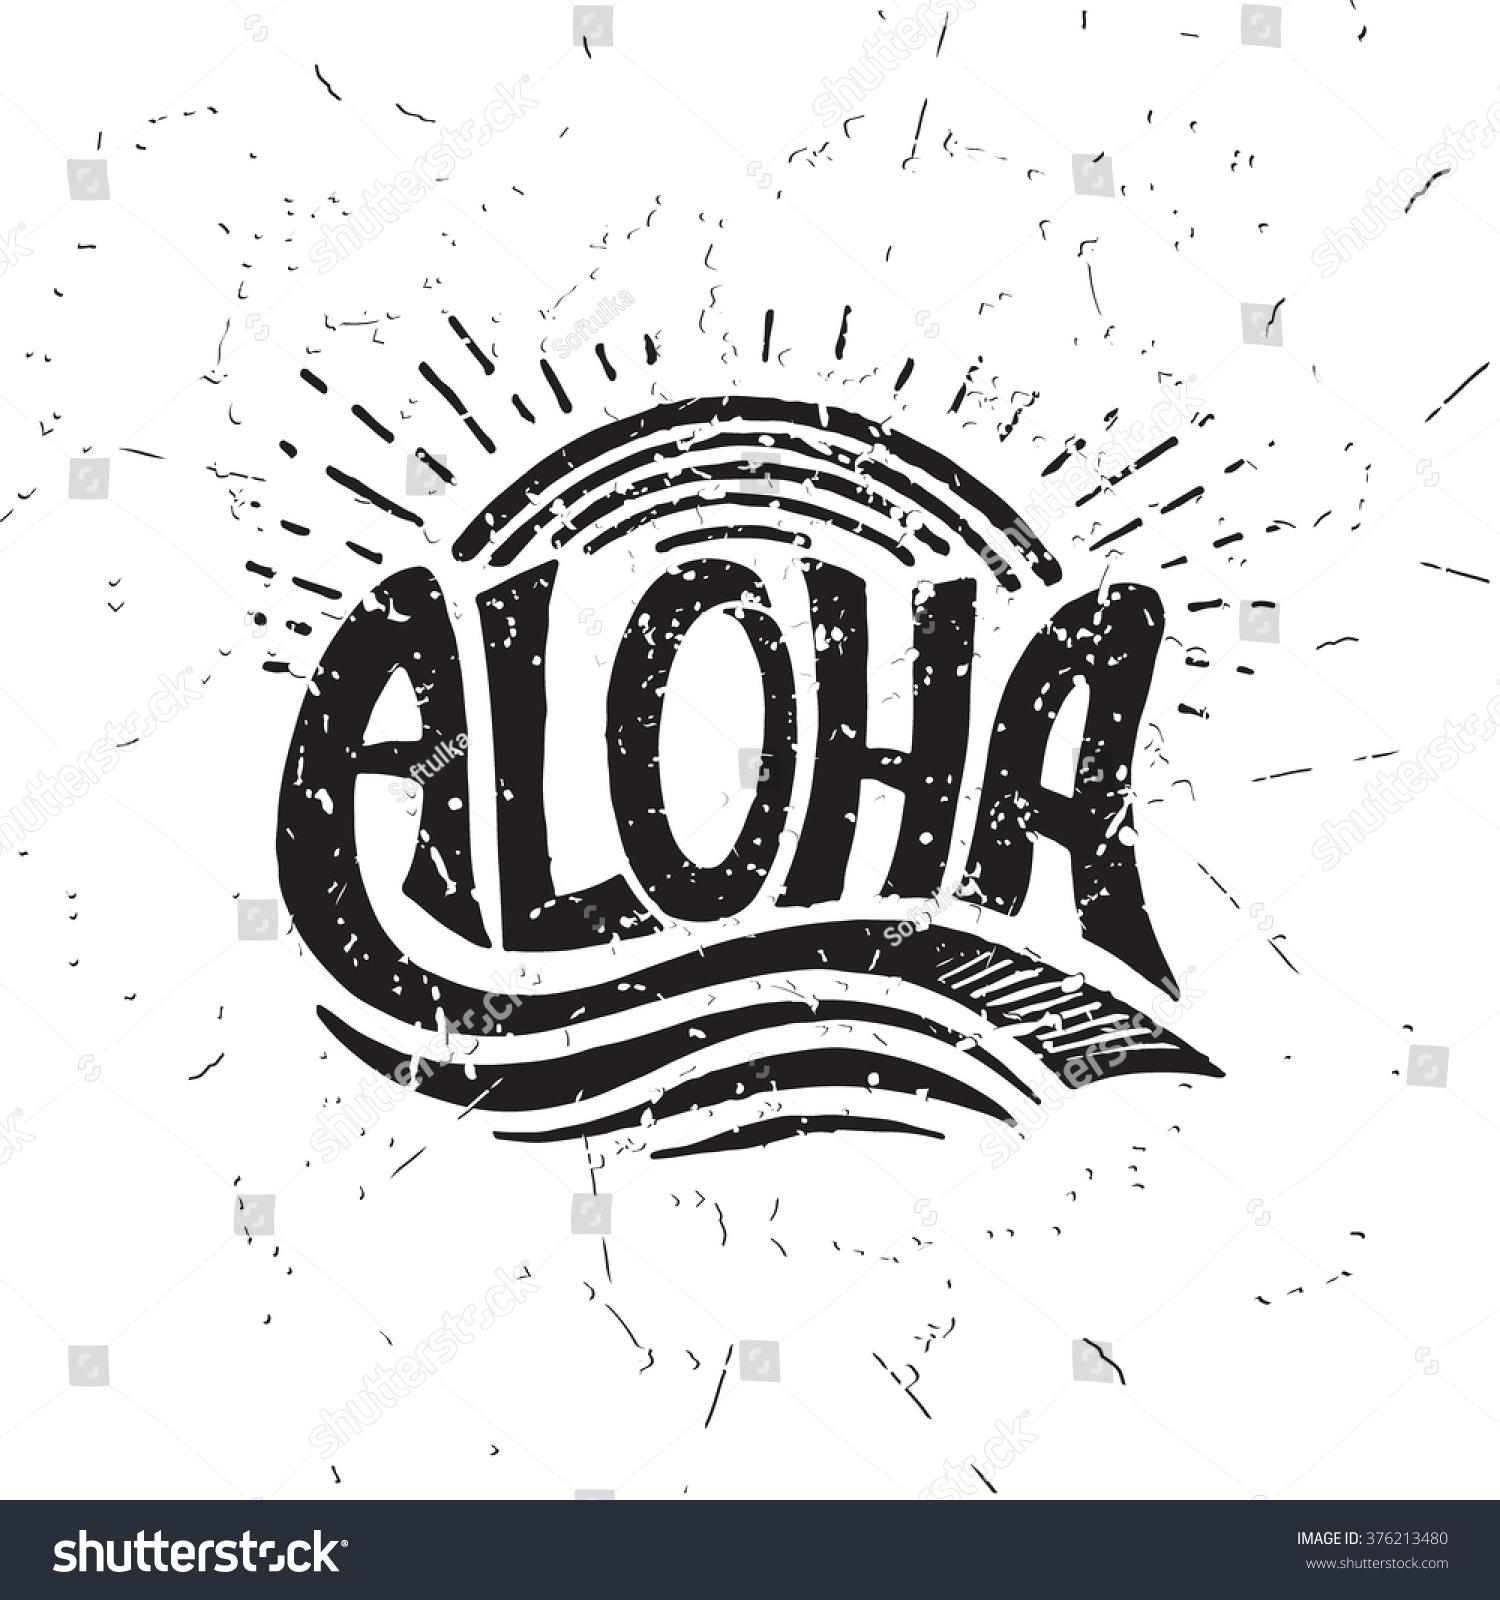 T-shirt design handmade - Aloha Surfing Lettering Vector Calligraphy Illustration Hawaiian Handmade Tropical Exotic T Shirt Graphics